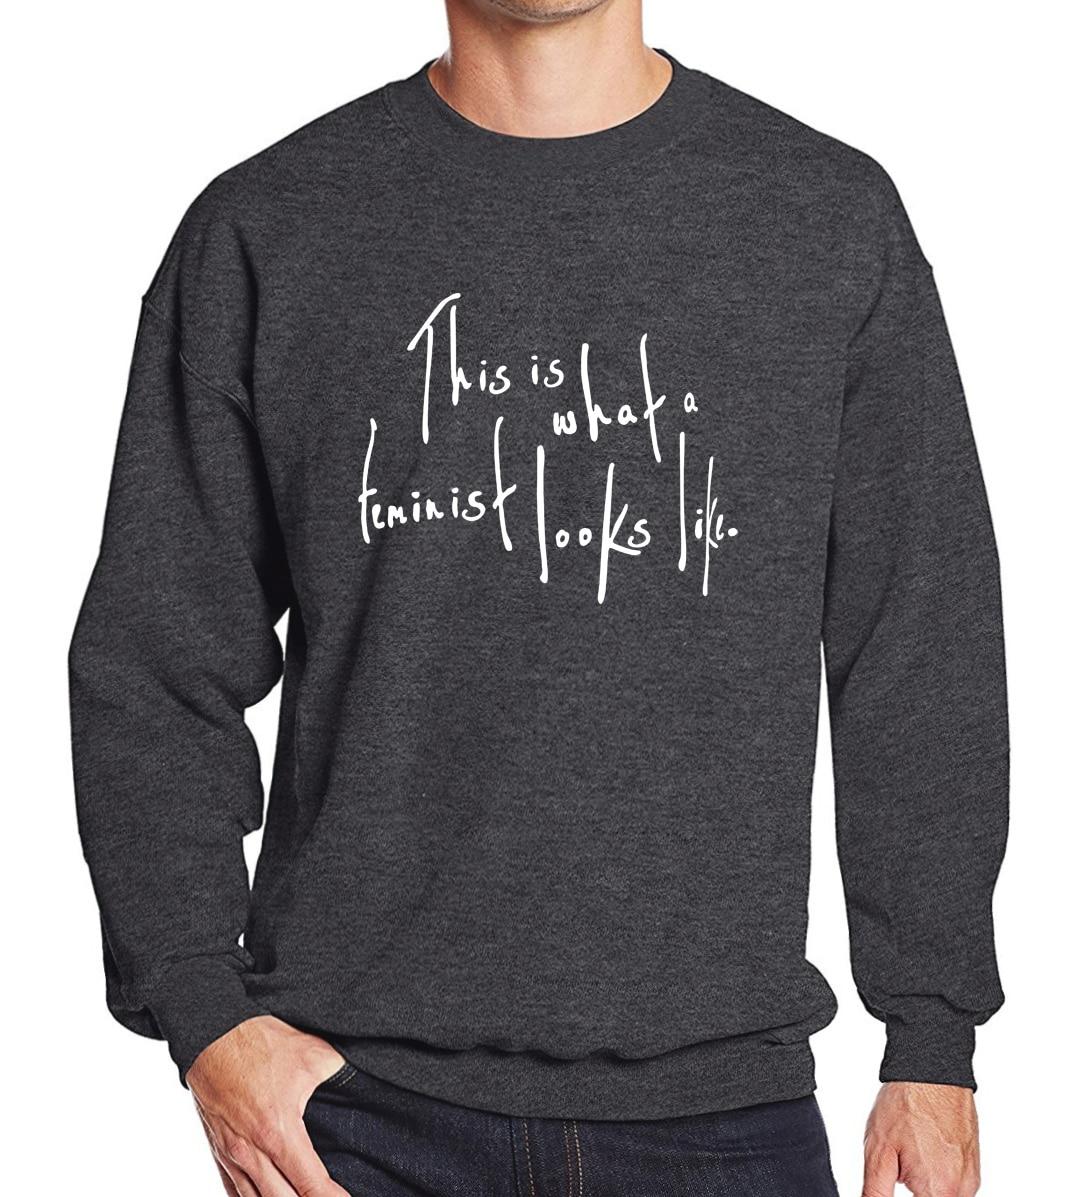 Sweatshirt men hoodies 2018 spring winter This Is What a Feminist Looks Like printed fleece tracksuits brand-clothing hip hop